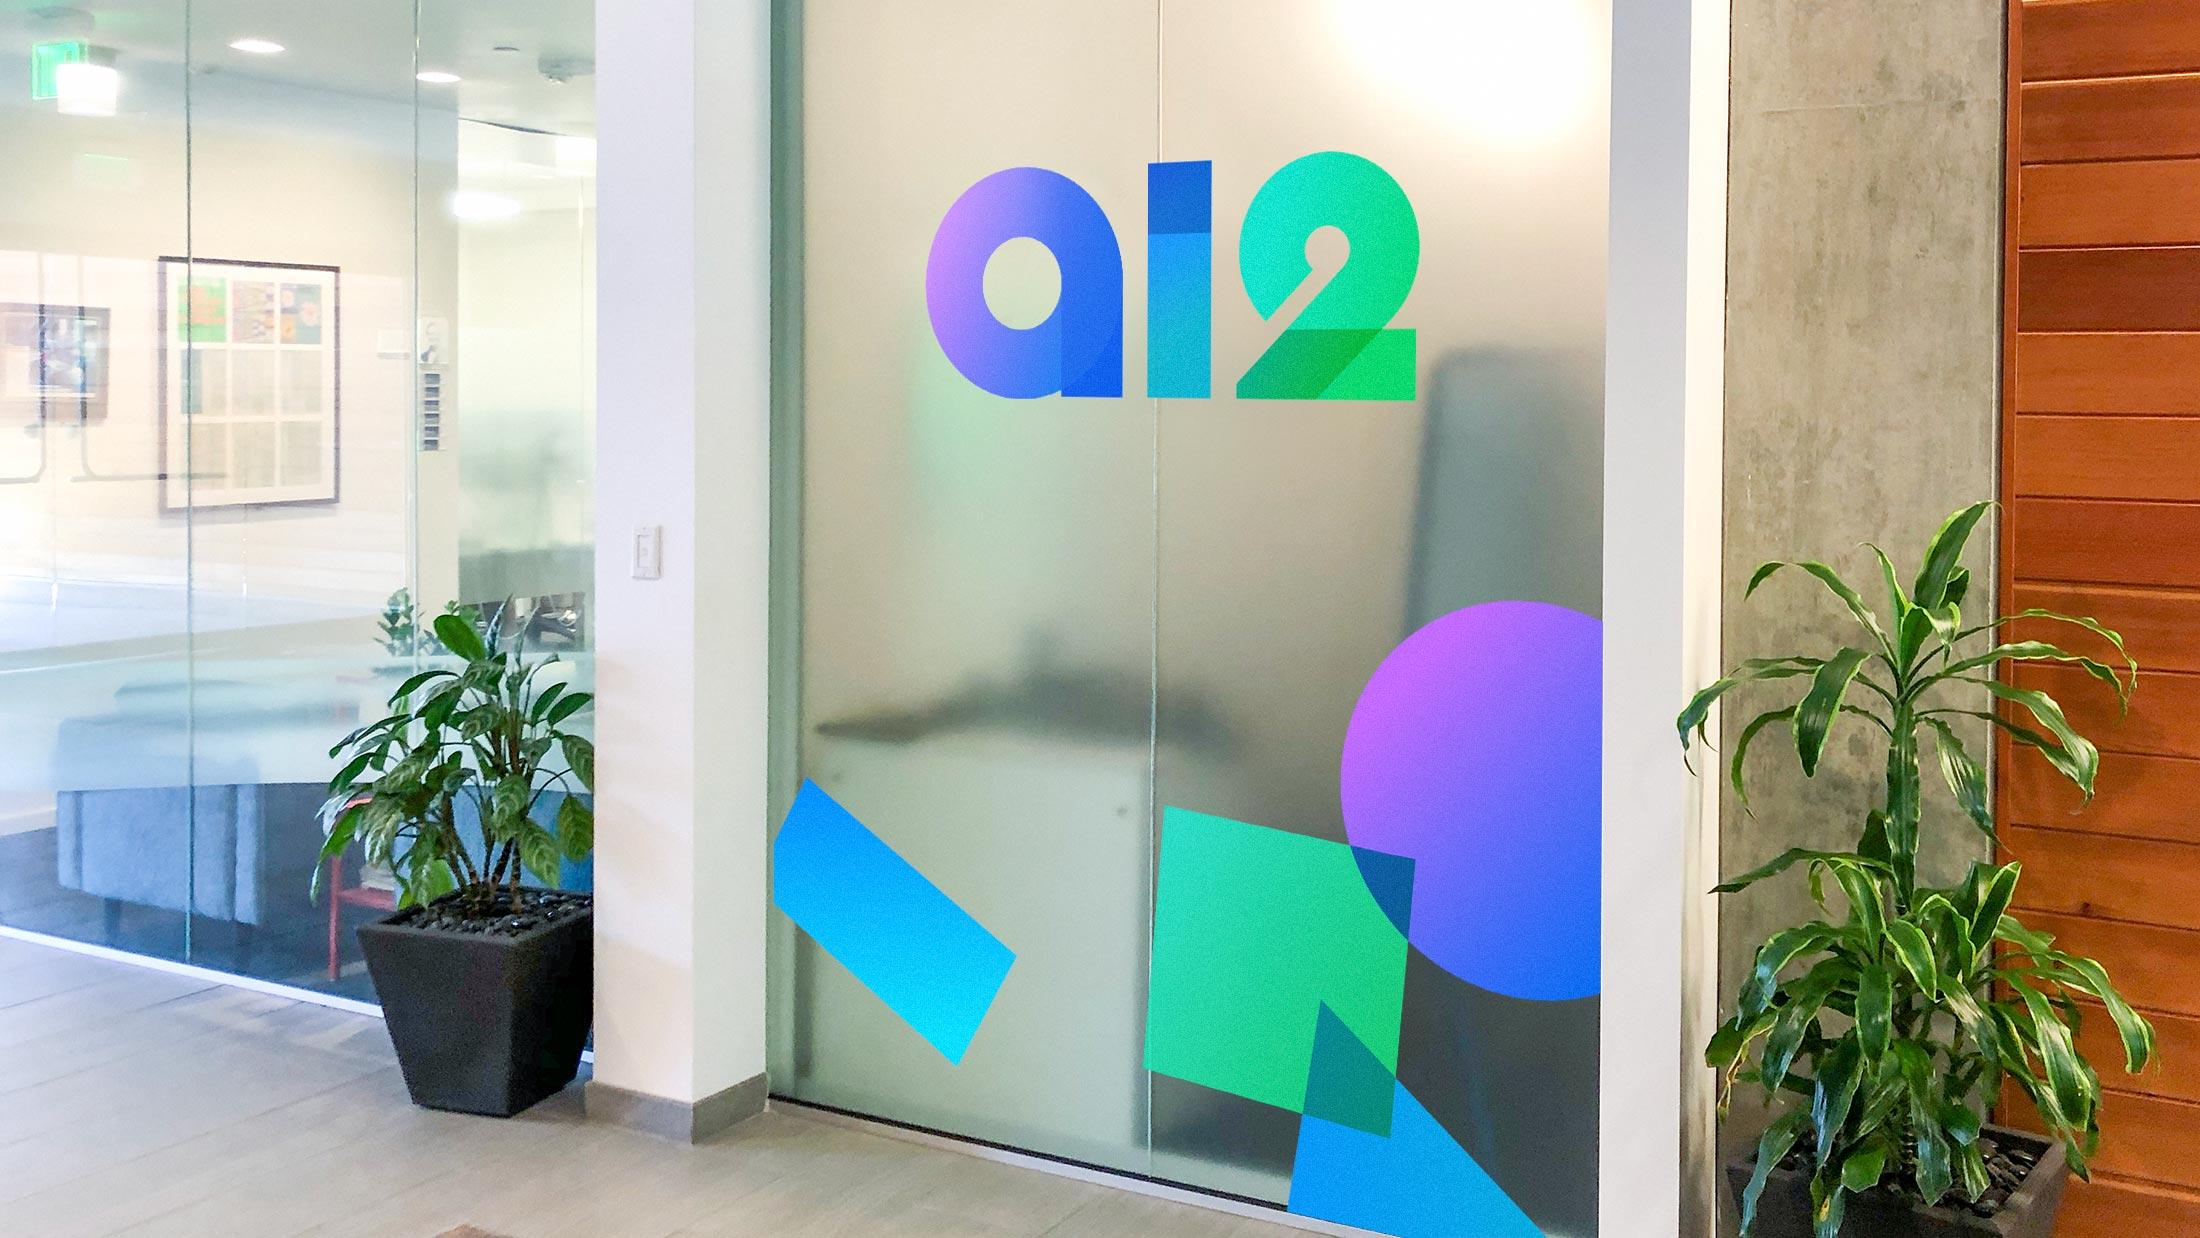 c2-sign-hall